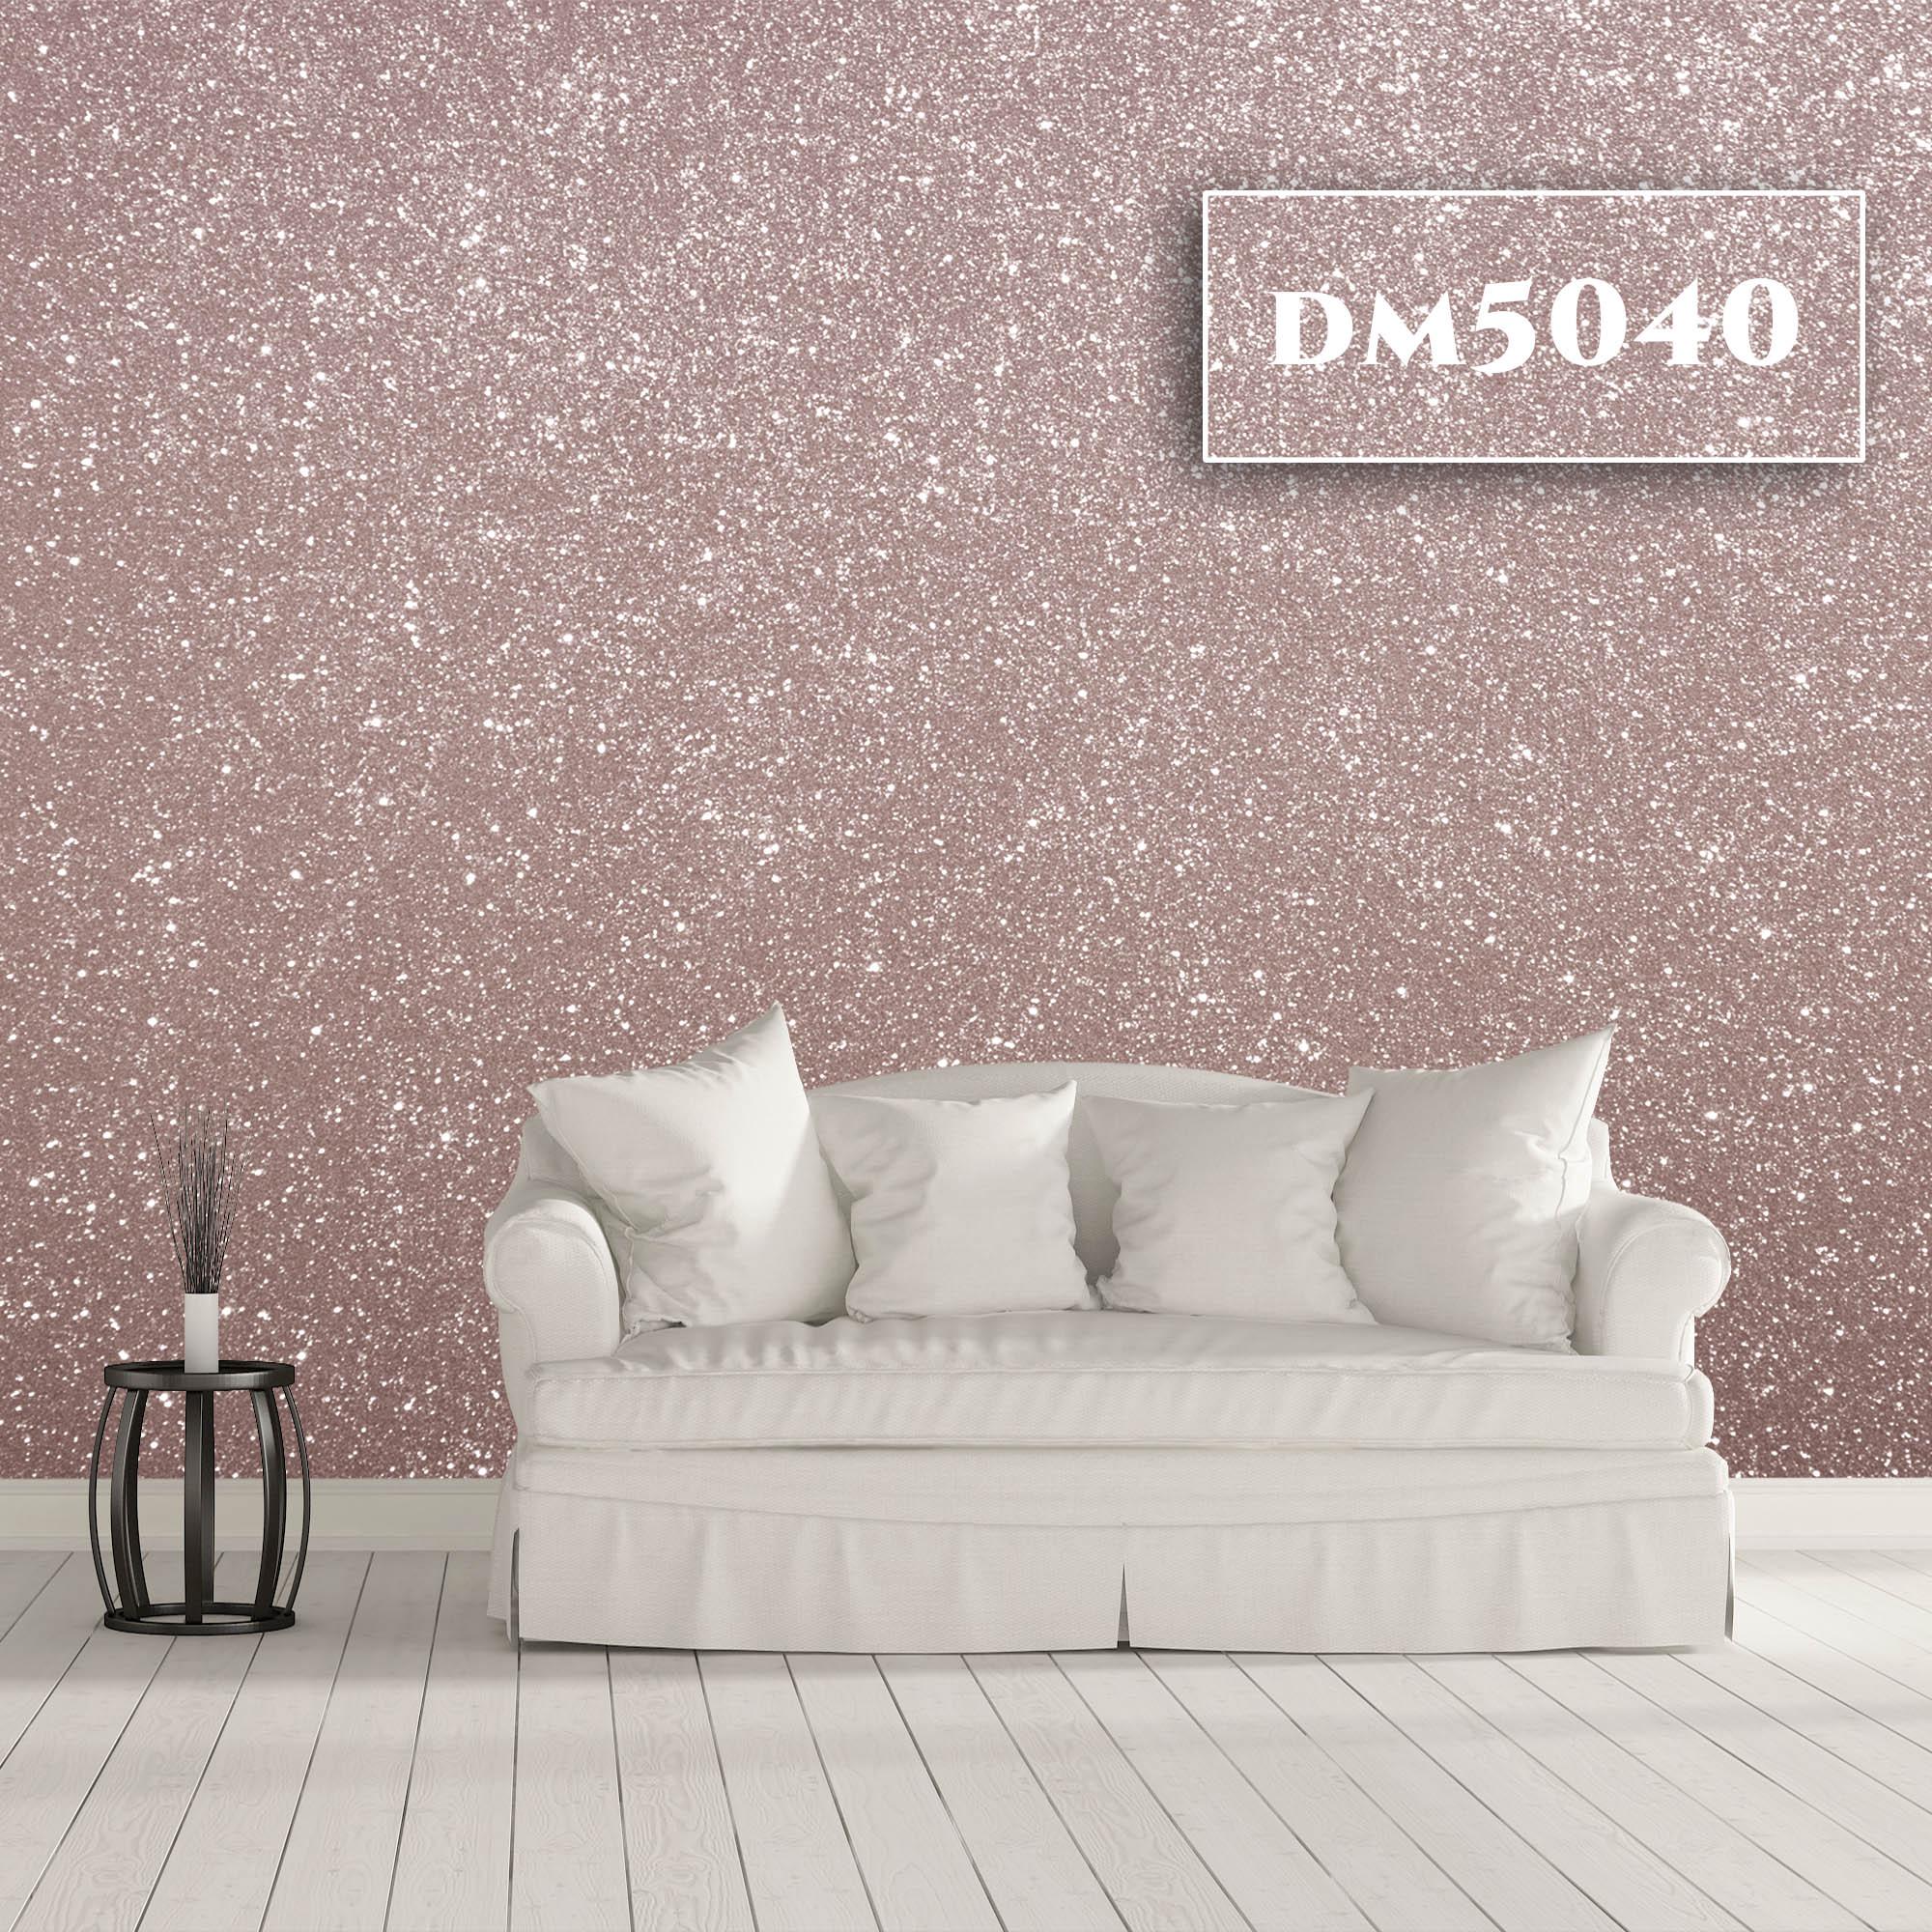 DM5040